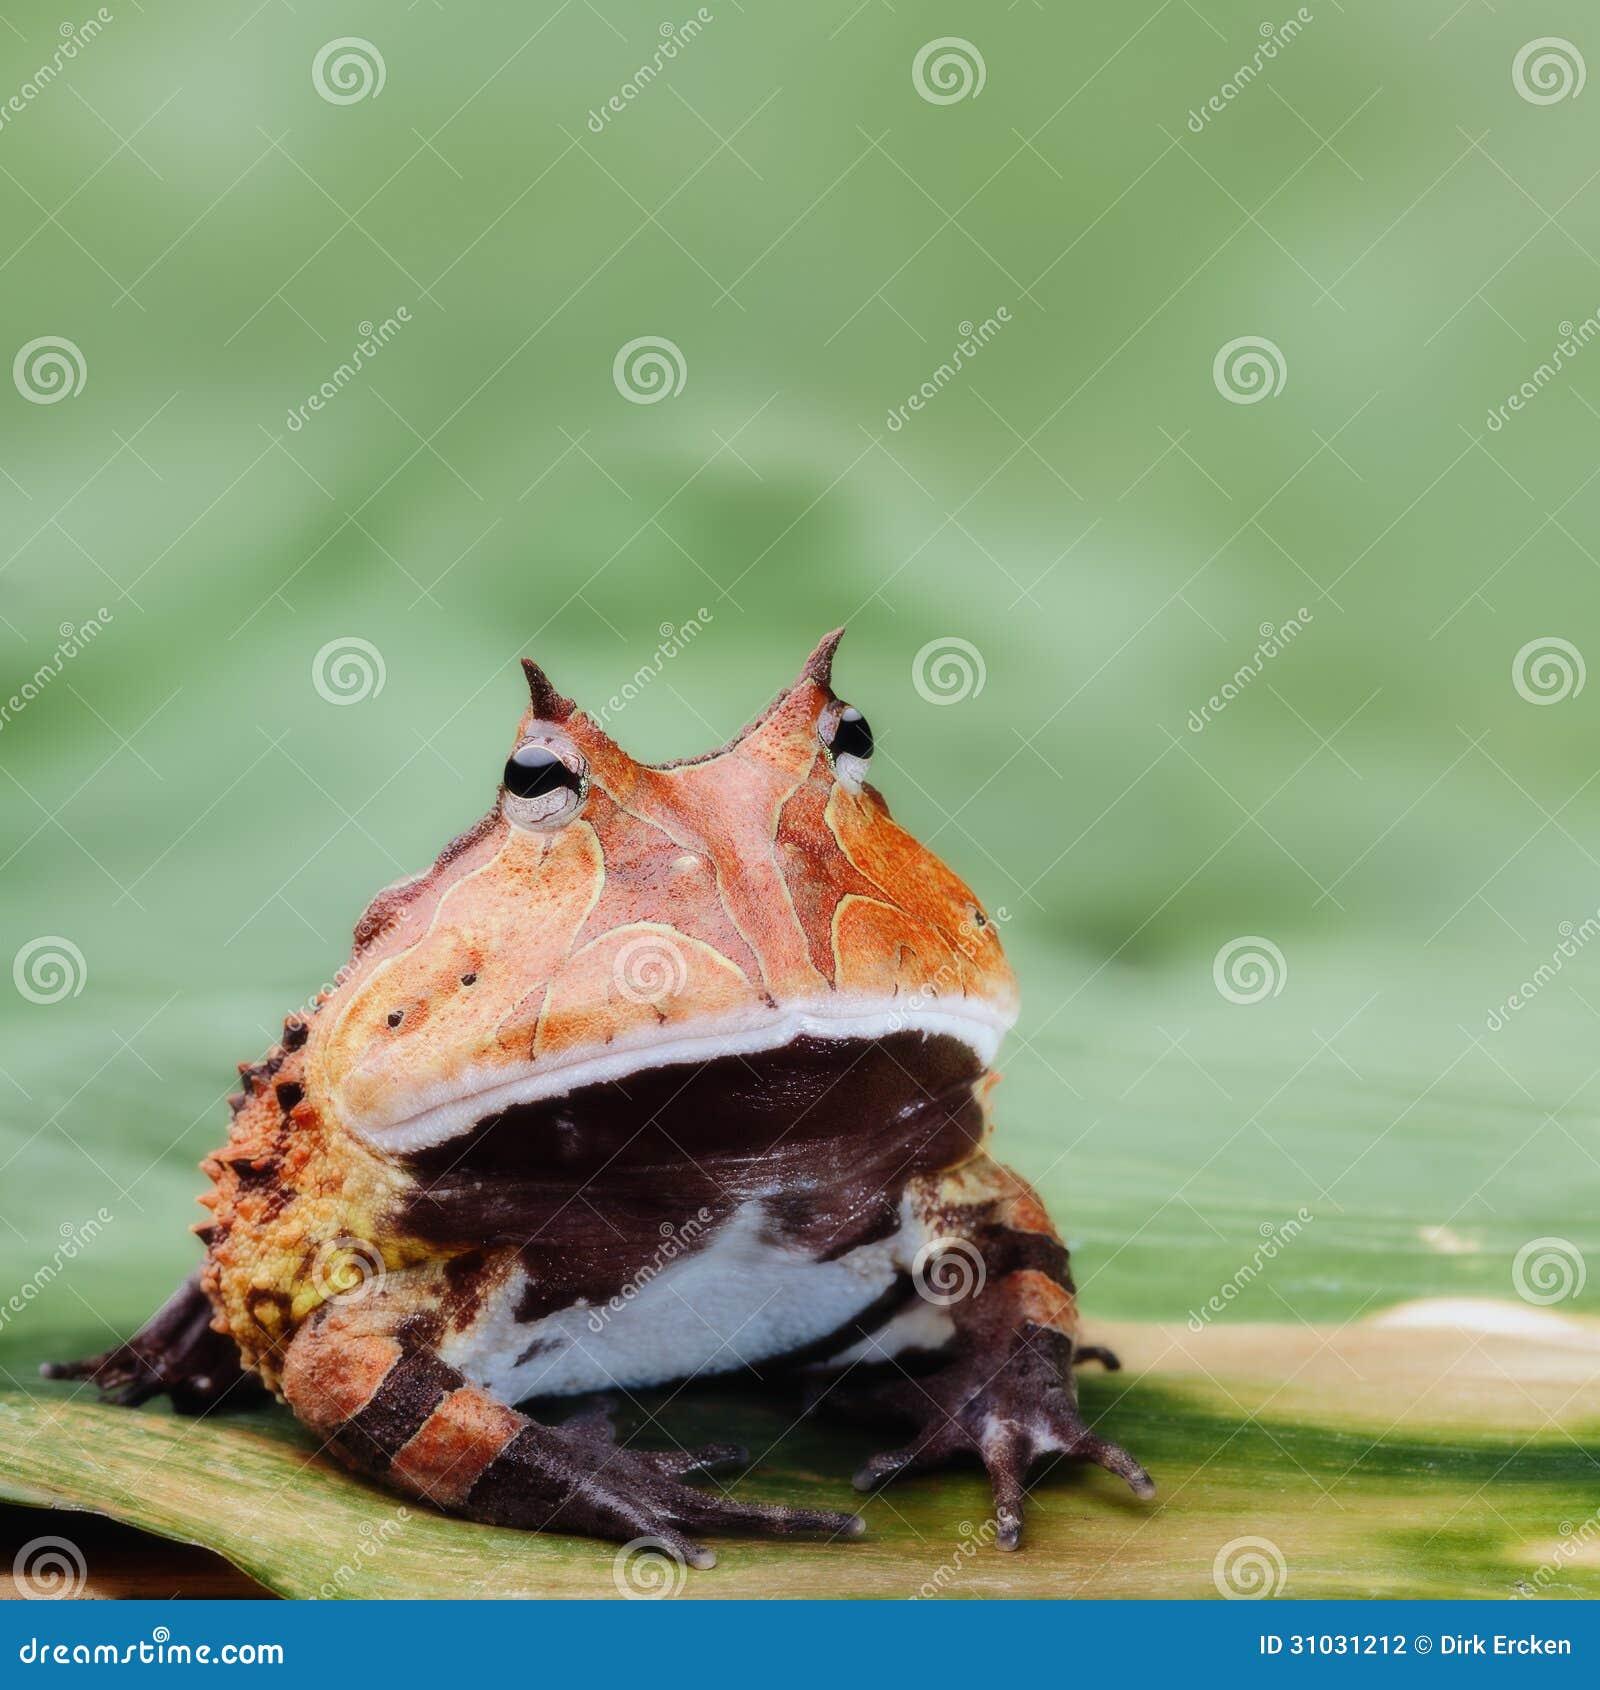 pacman frosch oder geh rnte kr te amazonas regenwald stockfotografie bild 31031212. Black Bedroom Furniture Sets. Home Design Ideas